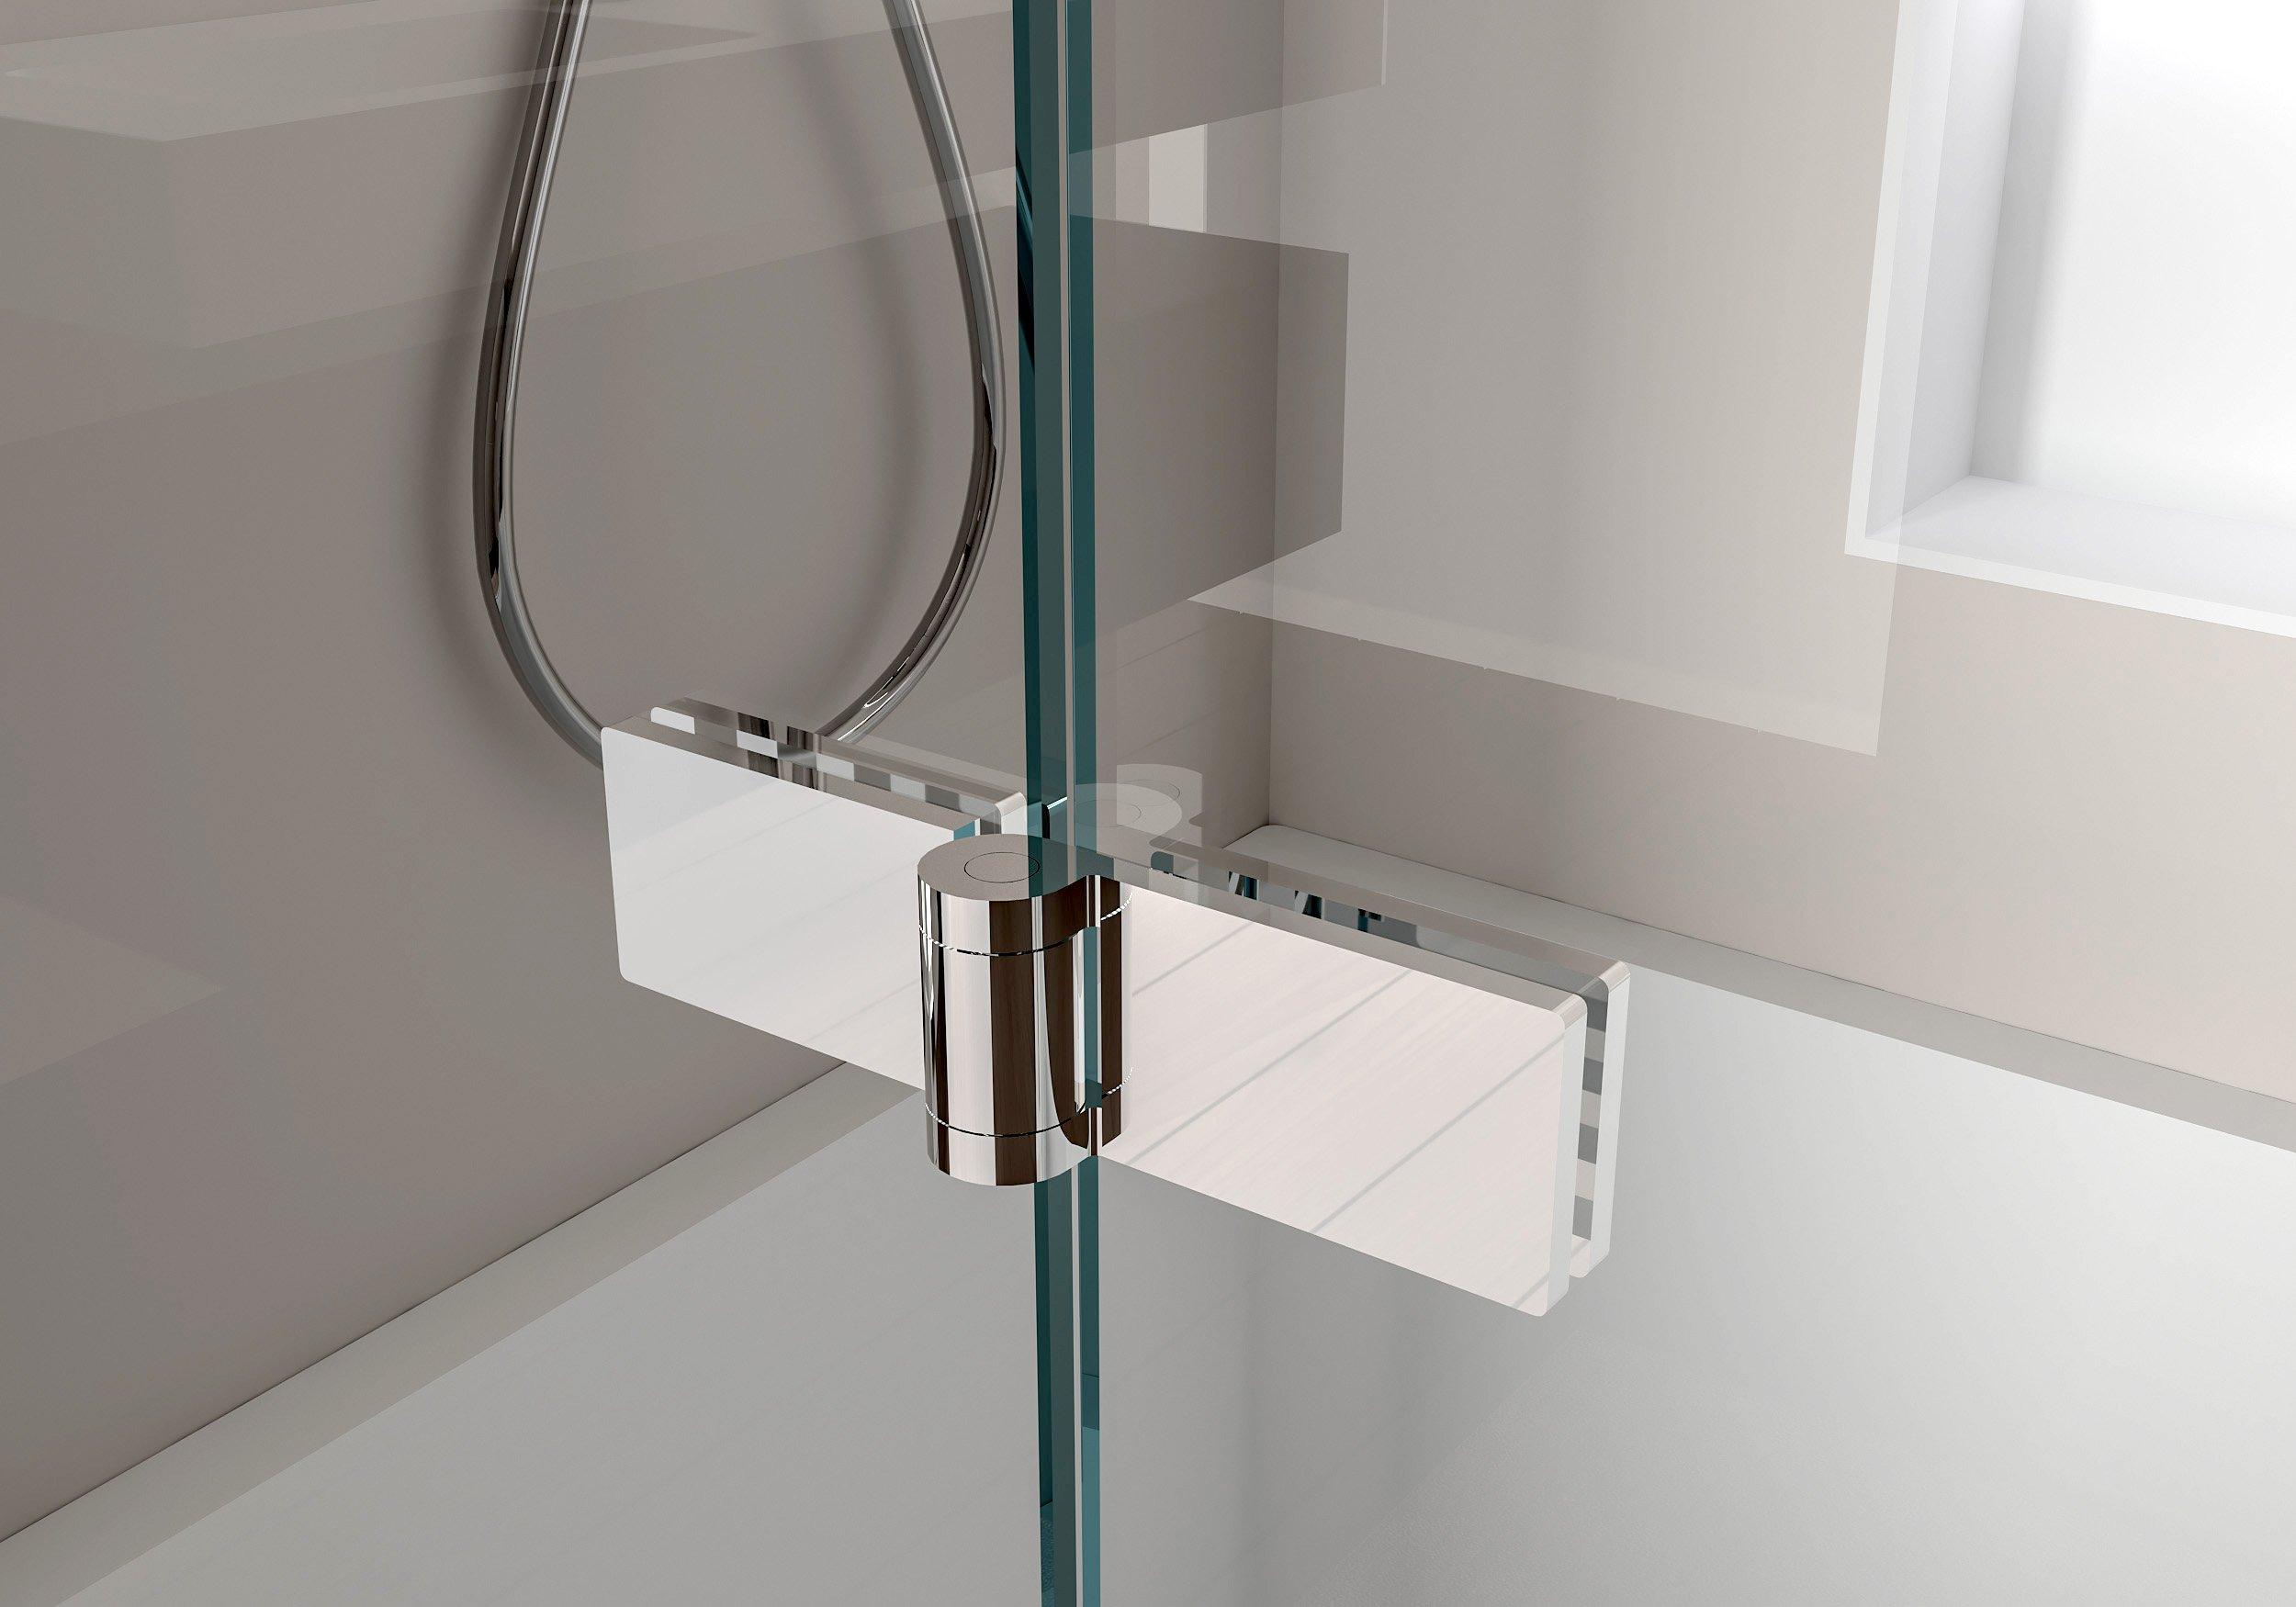 Duschabtrennung Duschwand Badewanne Nano Echtglas EX209 - 1200 x 1400 x 6 mm zoom thumbnail 6